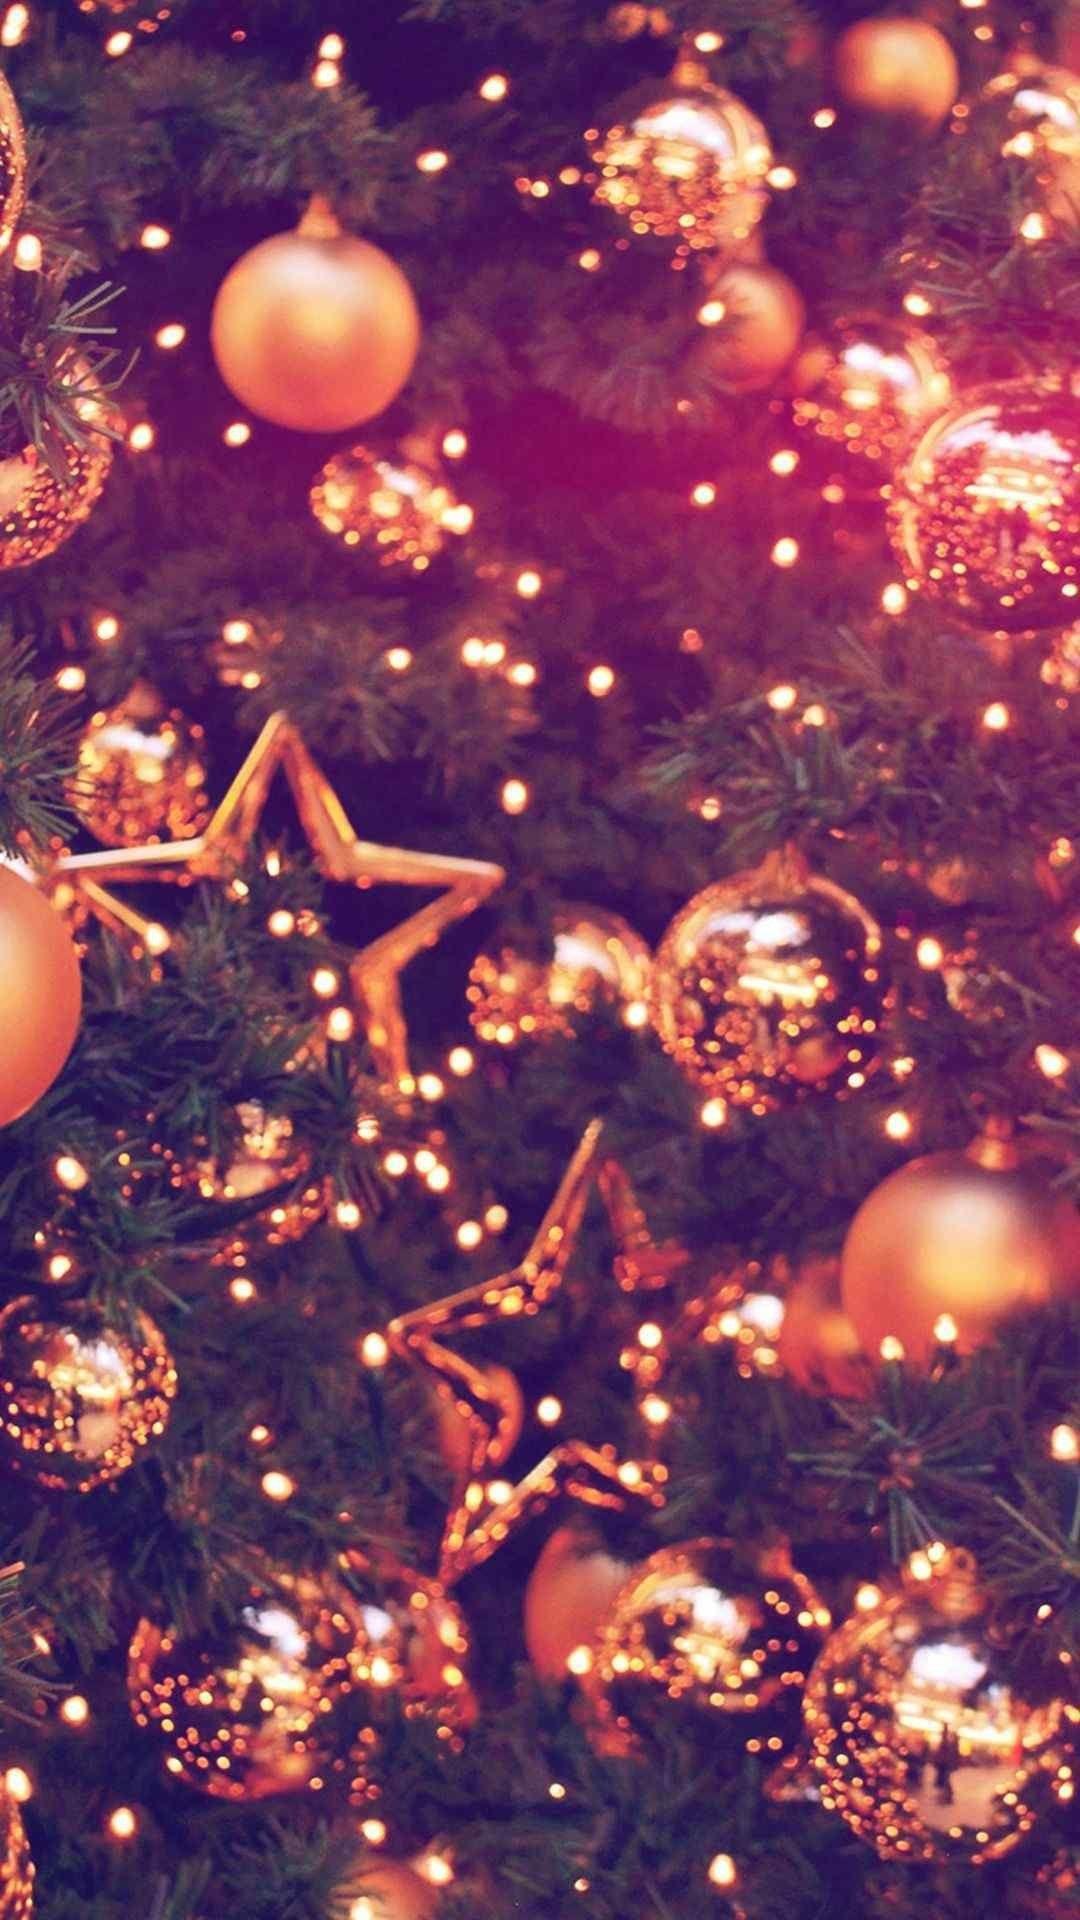 Pin By Nina Davituliani On Fondos Wallpaper Iphone Christmas Xmas Wallpaper Christmas Tree Wallpaper